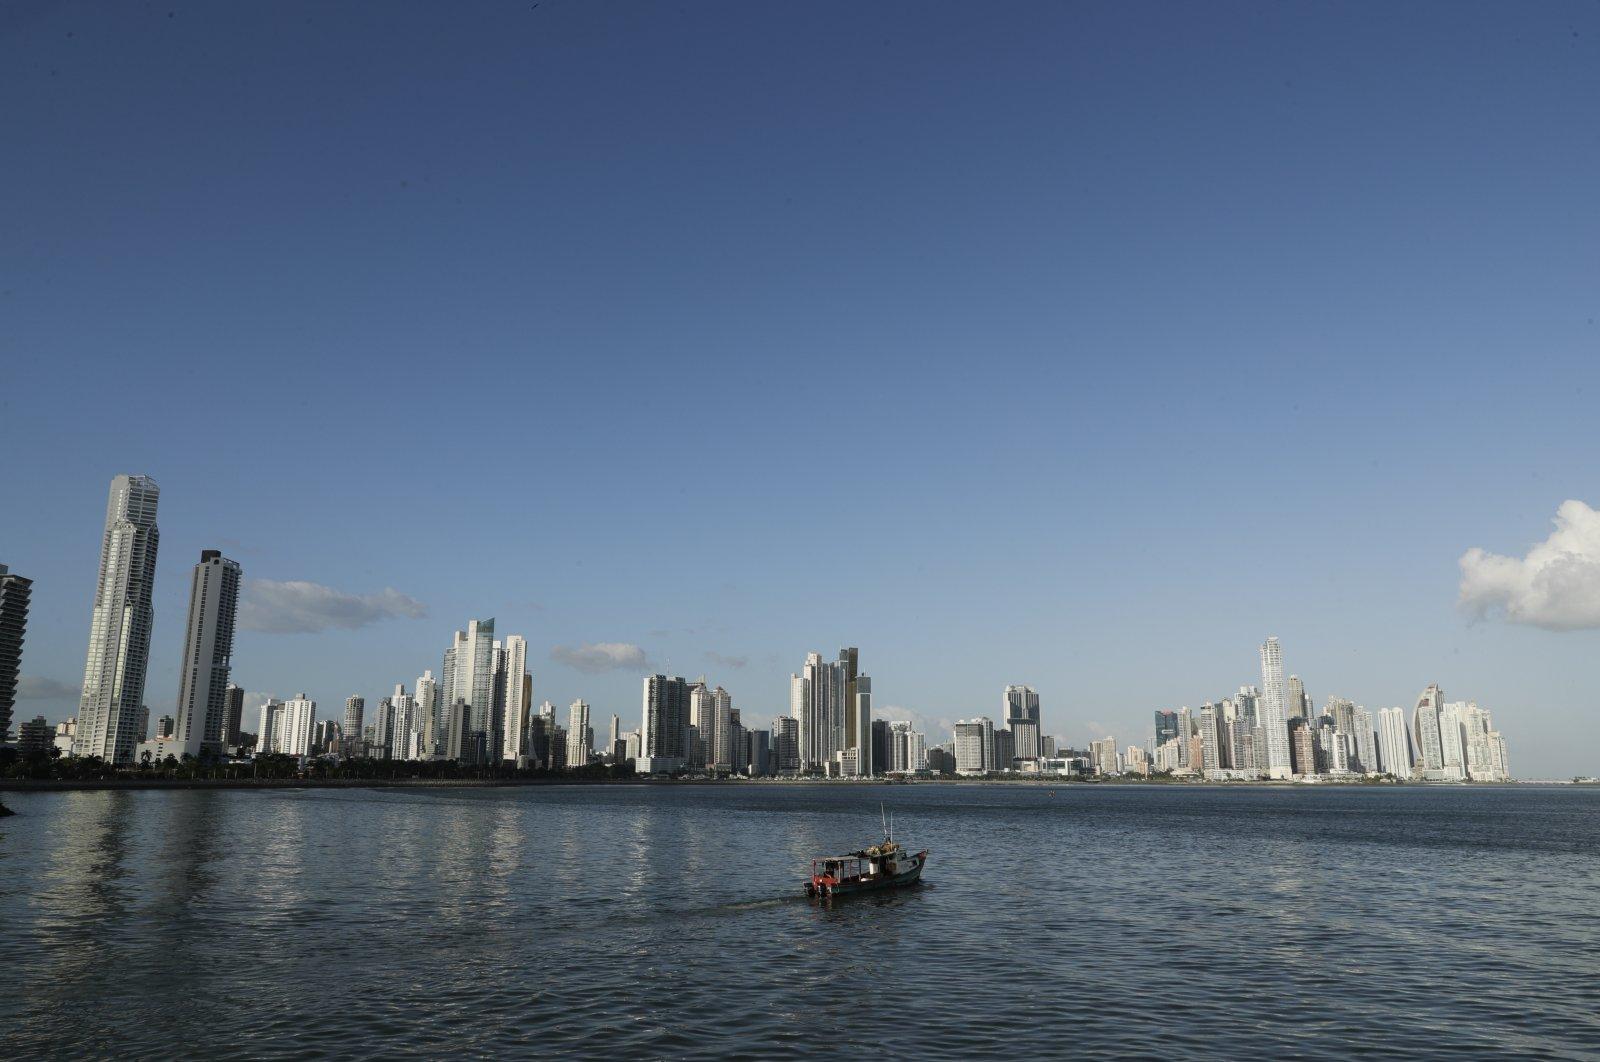 A fishing boat sails in Panama Bay, in Panama City, Panama, Jan. 19, 2021. (AP Photo)